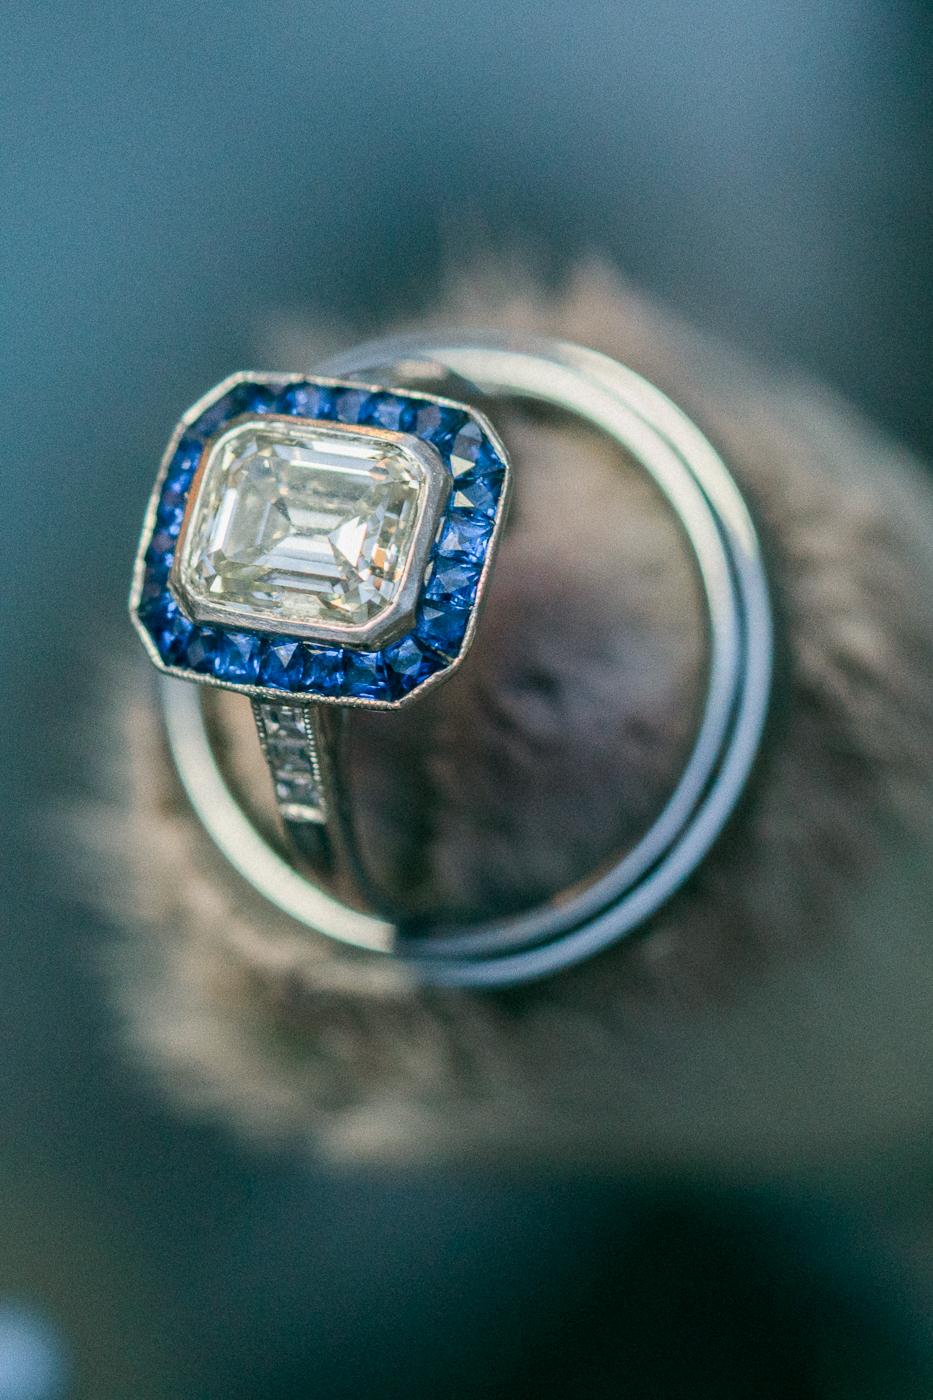 san-antonio-wedding-photographer-engagement-wedding-rings.jpg